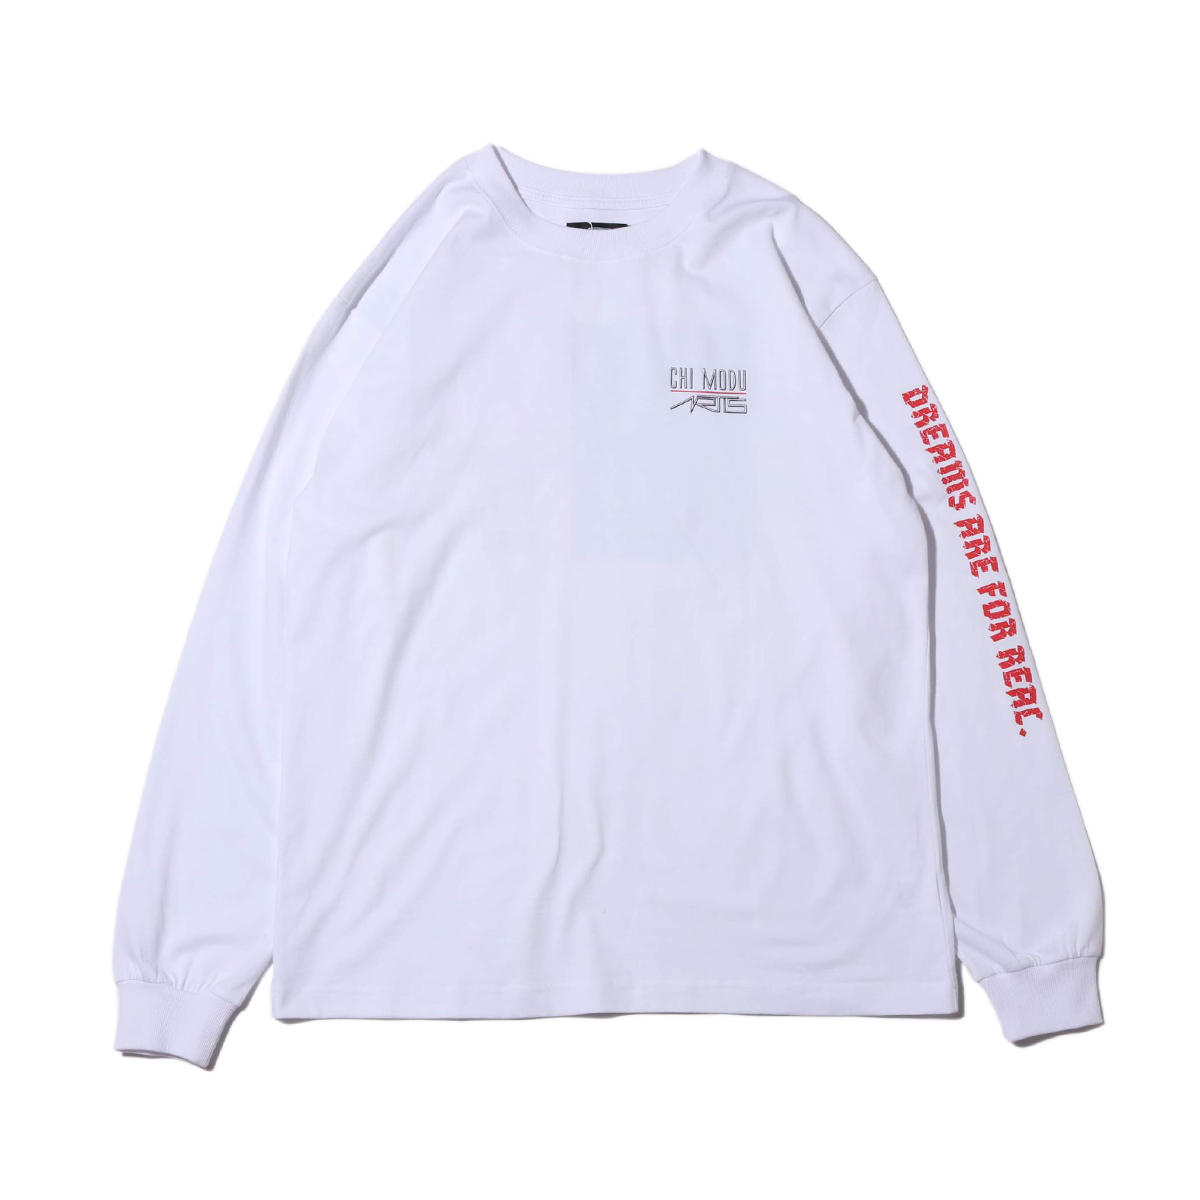 artis CHI BISHOP LS T-SHIRT(アーティズ チ ビショップ LS ティーシャツ)WHITE【メンズ 長袖Tシャツ】20SP-I